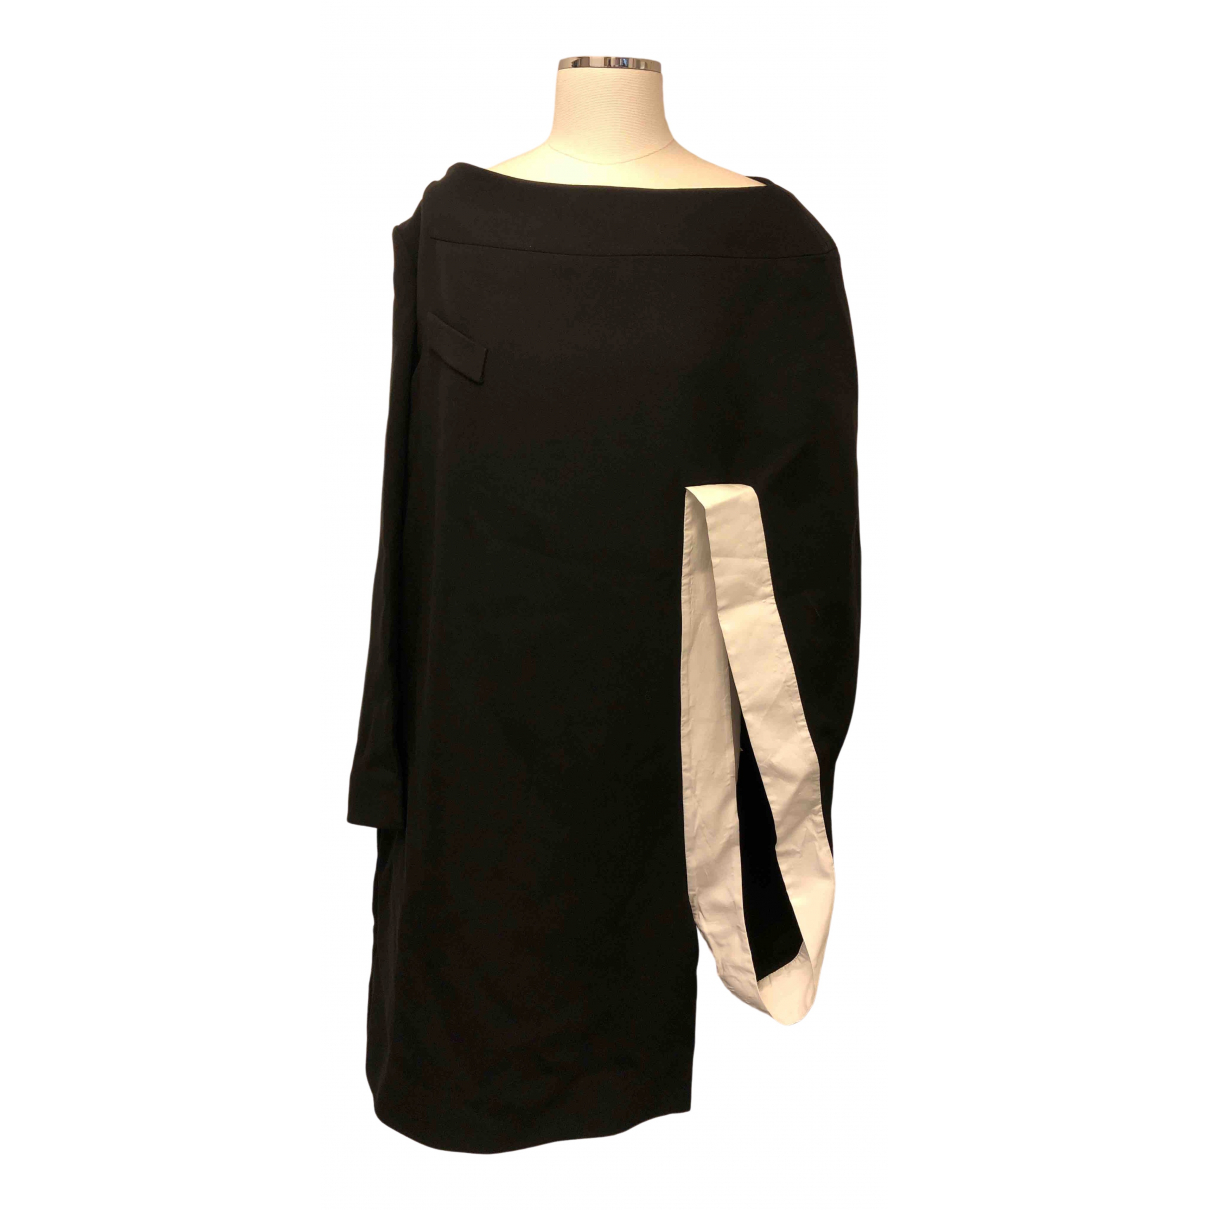 J.w. Anderson \N Kleid in  Schwarz Polyester